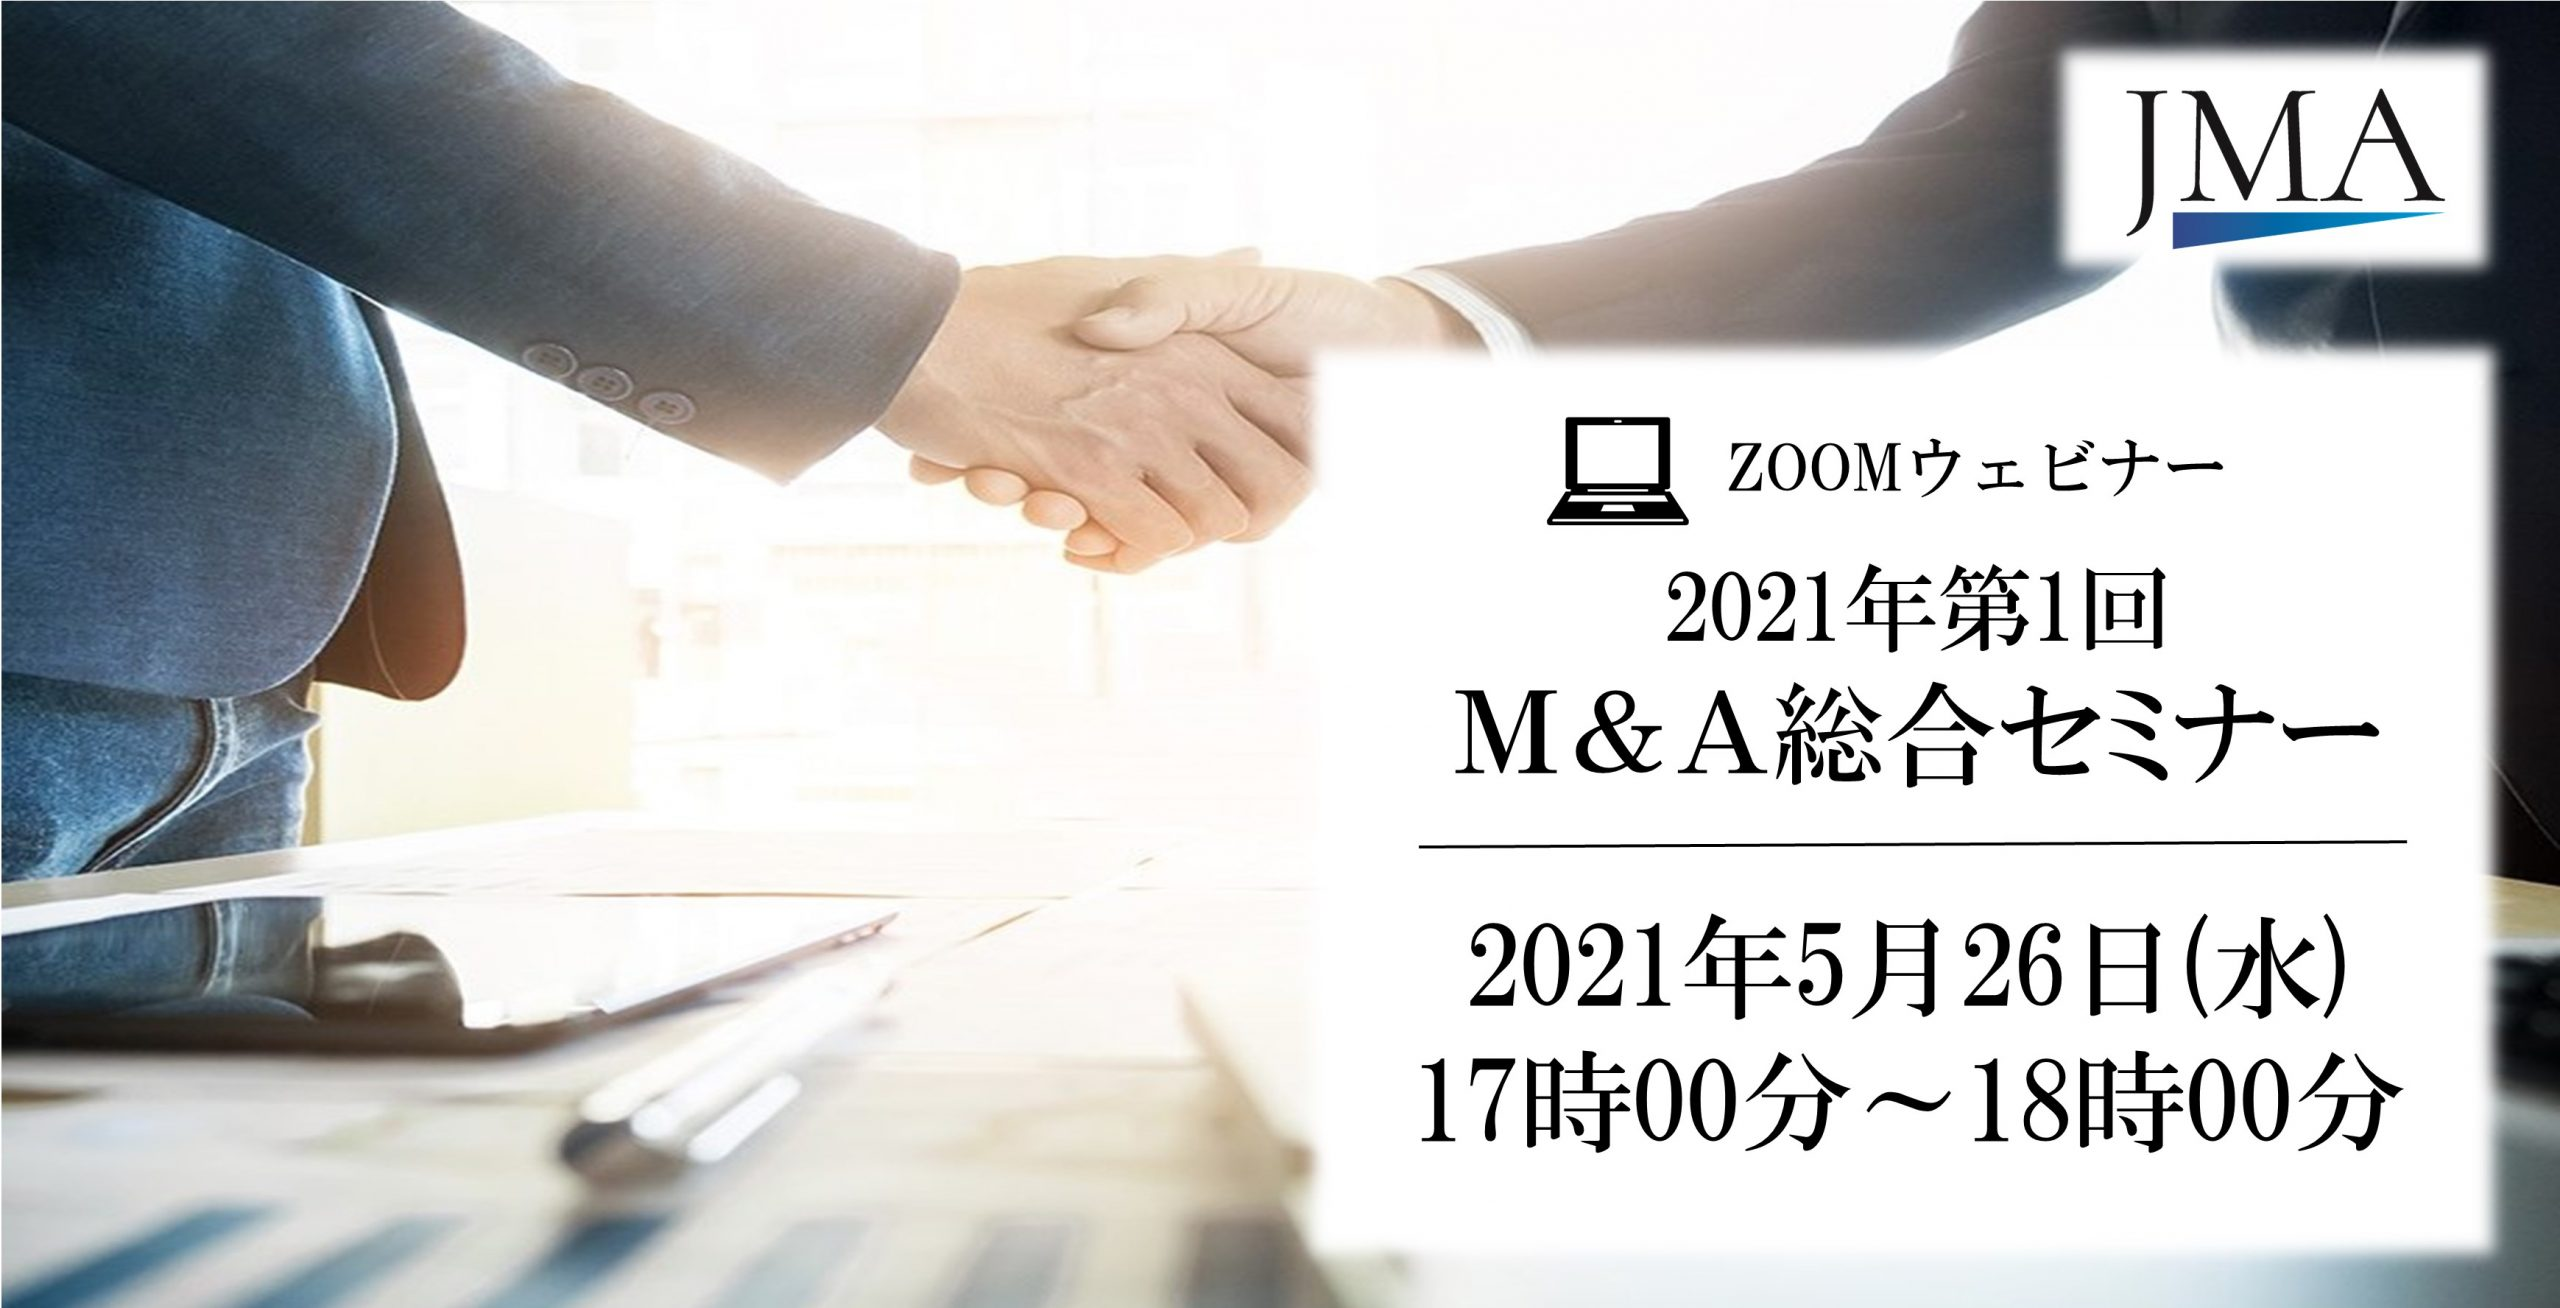 M&A総合セミナー